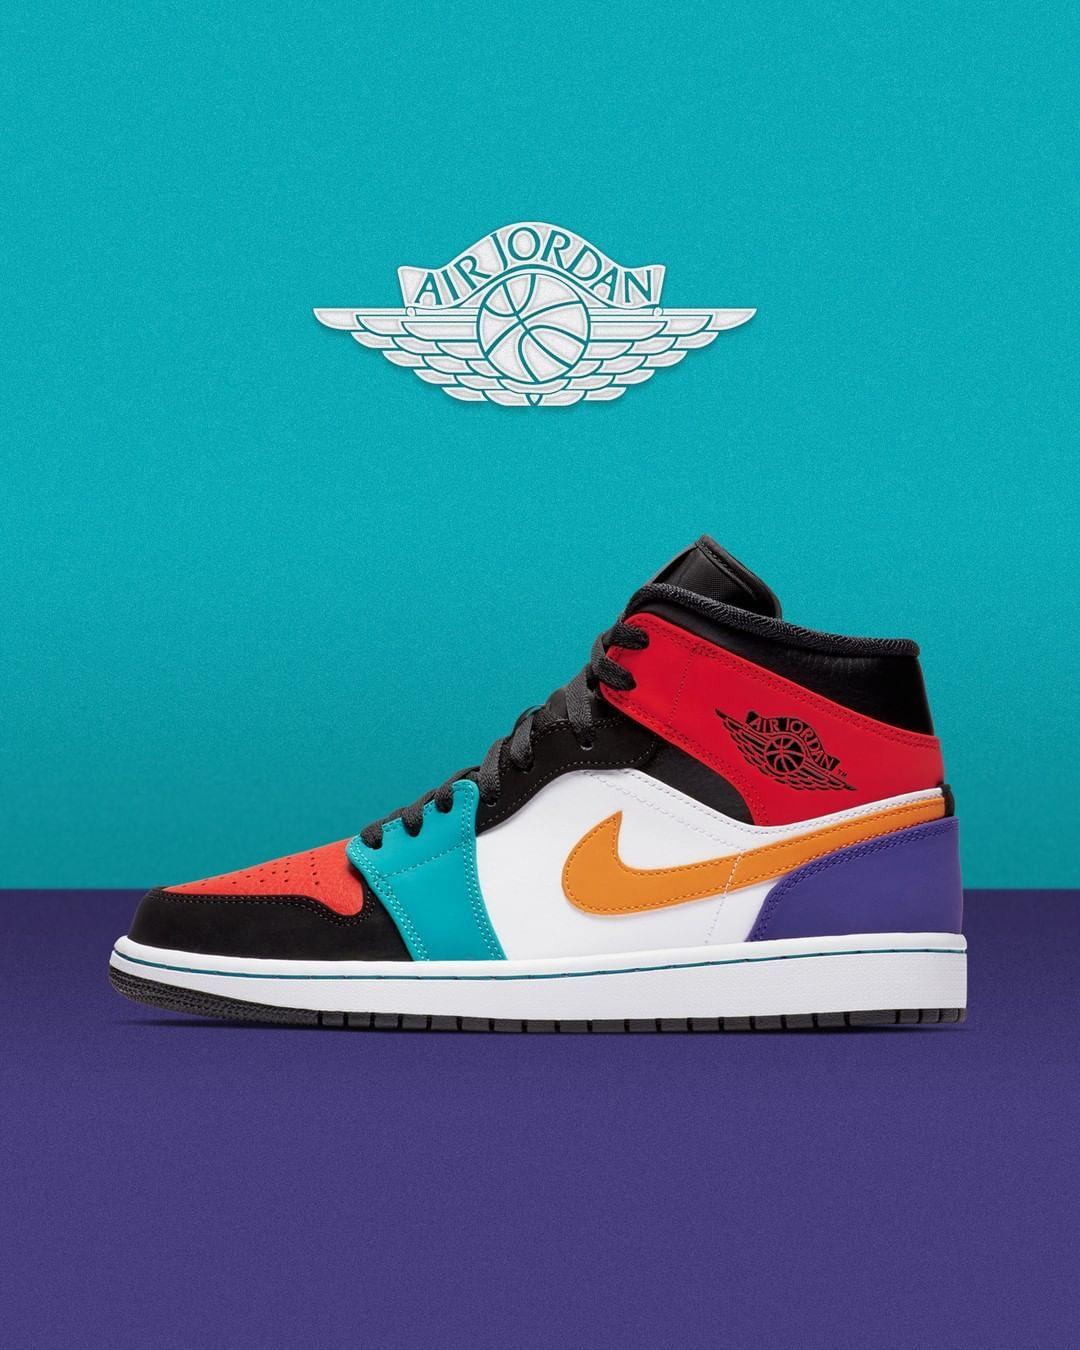 buy online 84245 63473 he Air Jordan 1 Mid Multicolor is now available online ⏩ www.sneak-a-venue. com  AirJordan1Mid  Multicolor  sneakAvenue . . .  airjordan